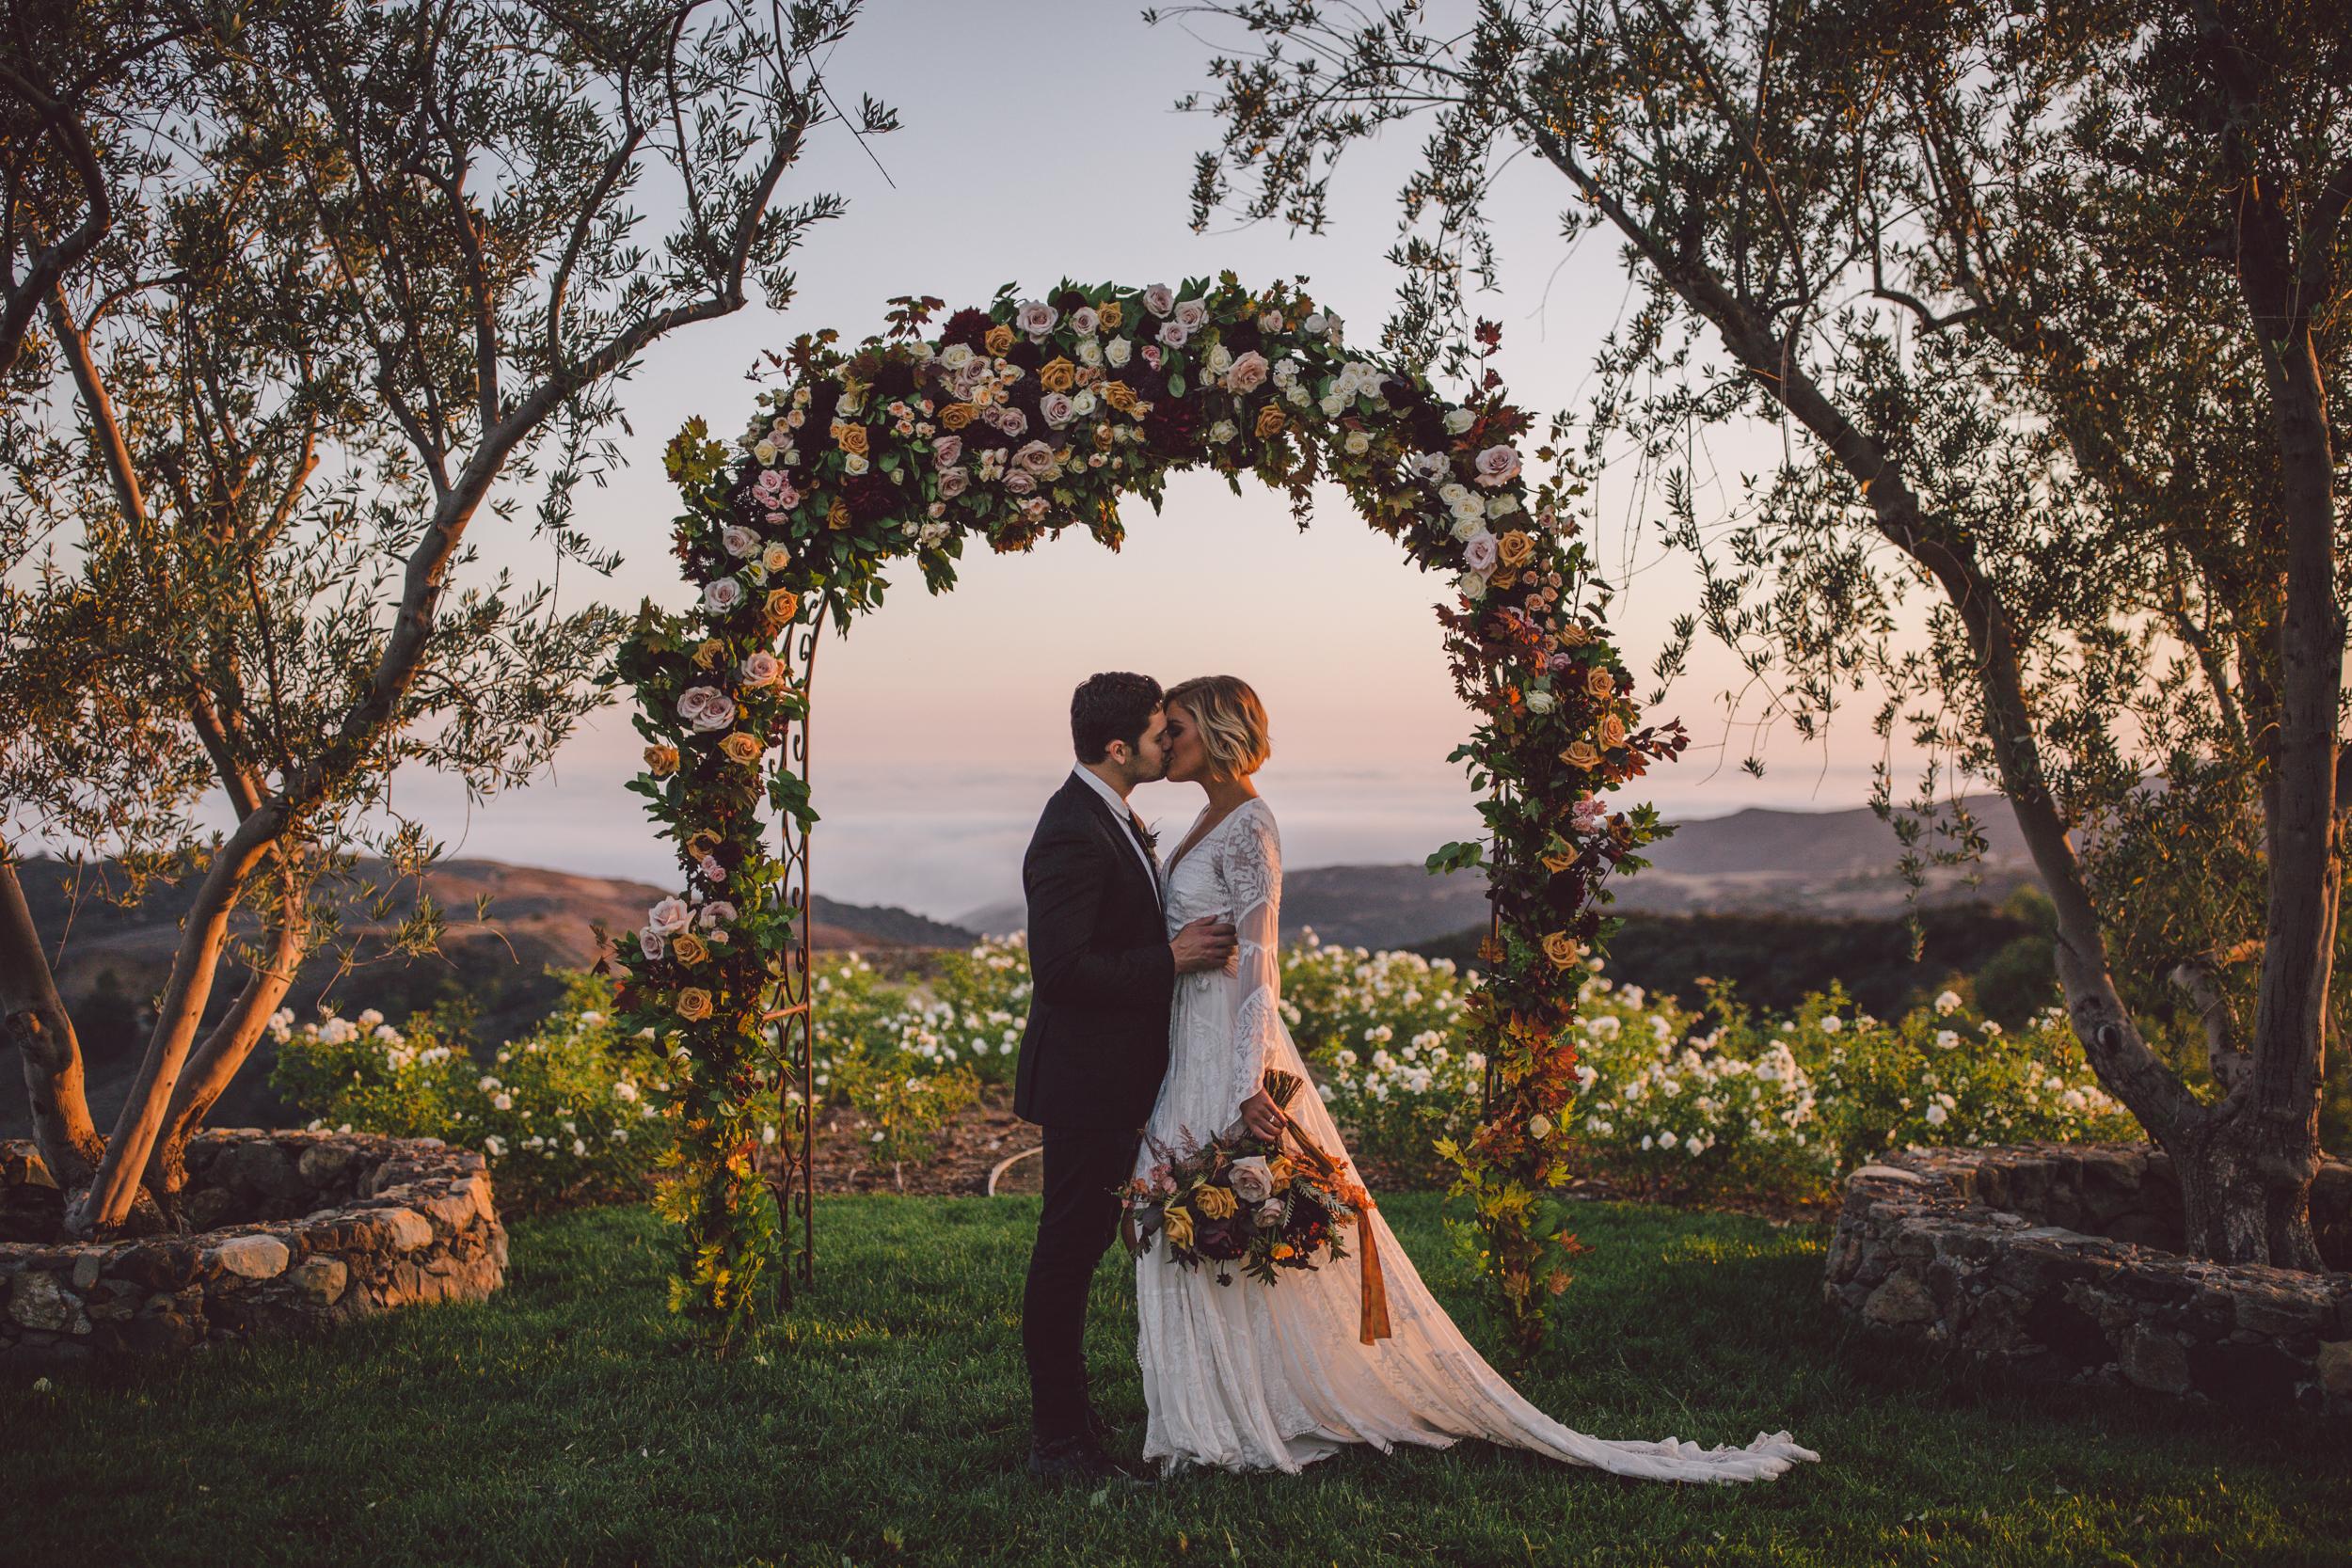 sunset-ceremony-flower arch-malibu-stonewall ranch-boho